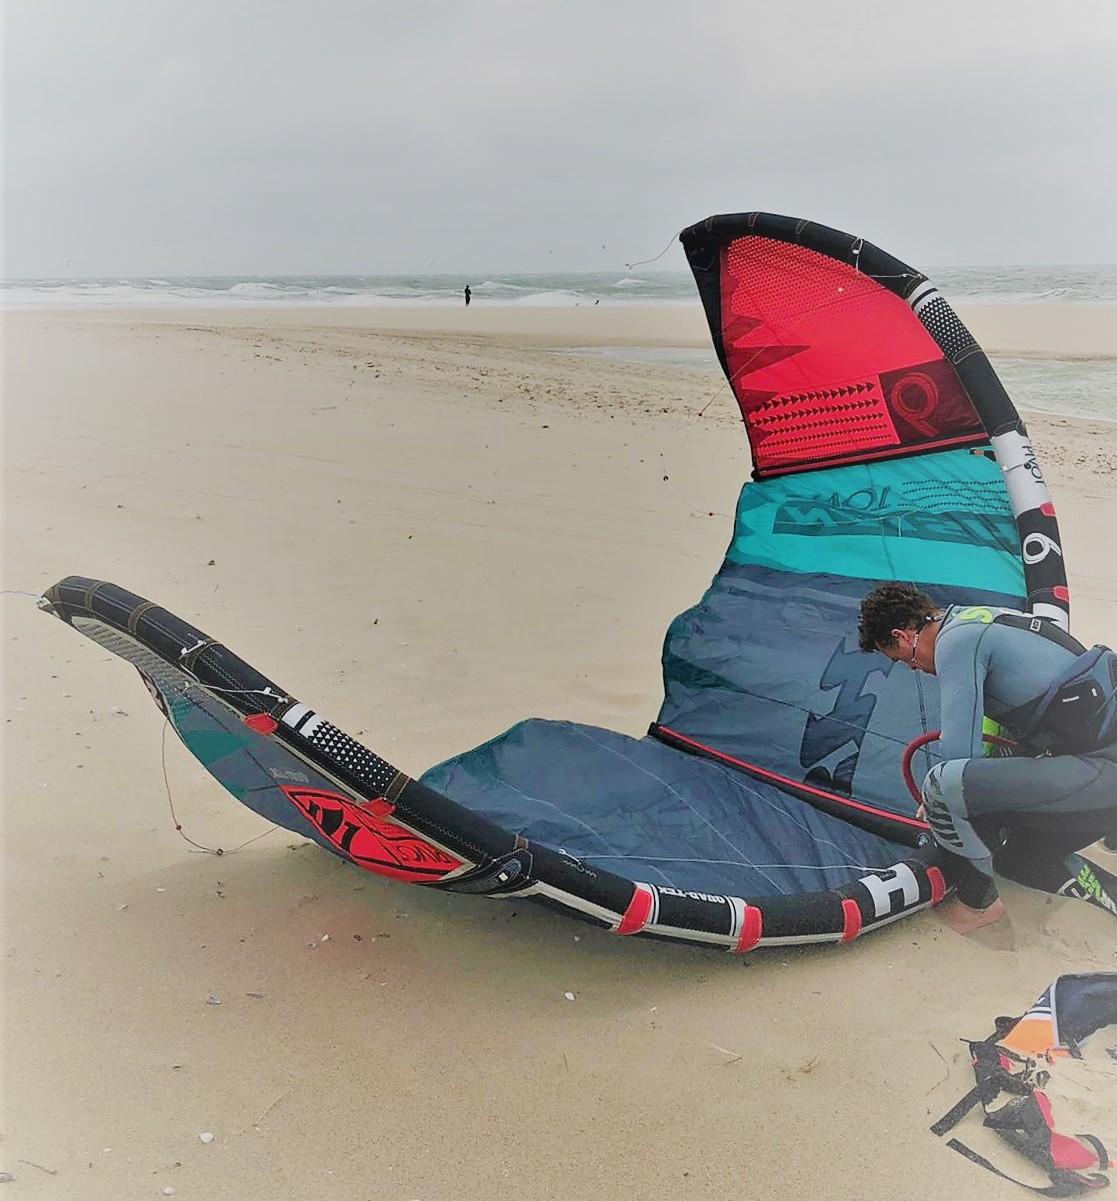 Kitesurfen actuele en weer- en windvoorspelling